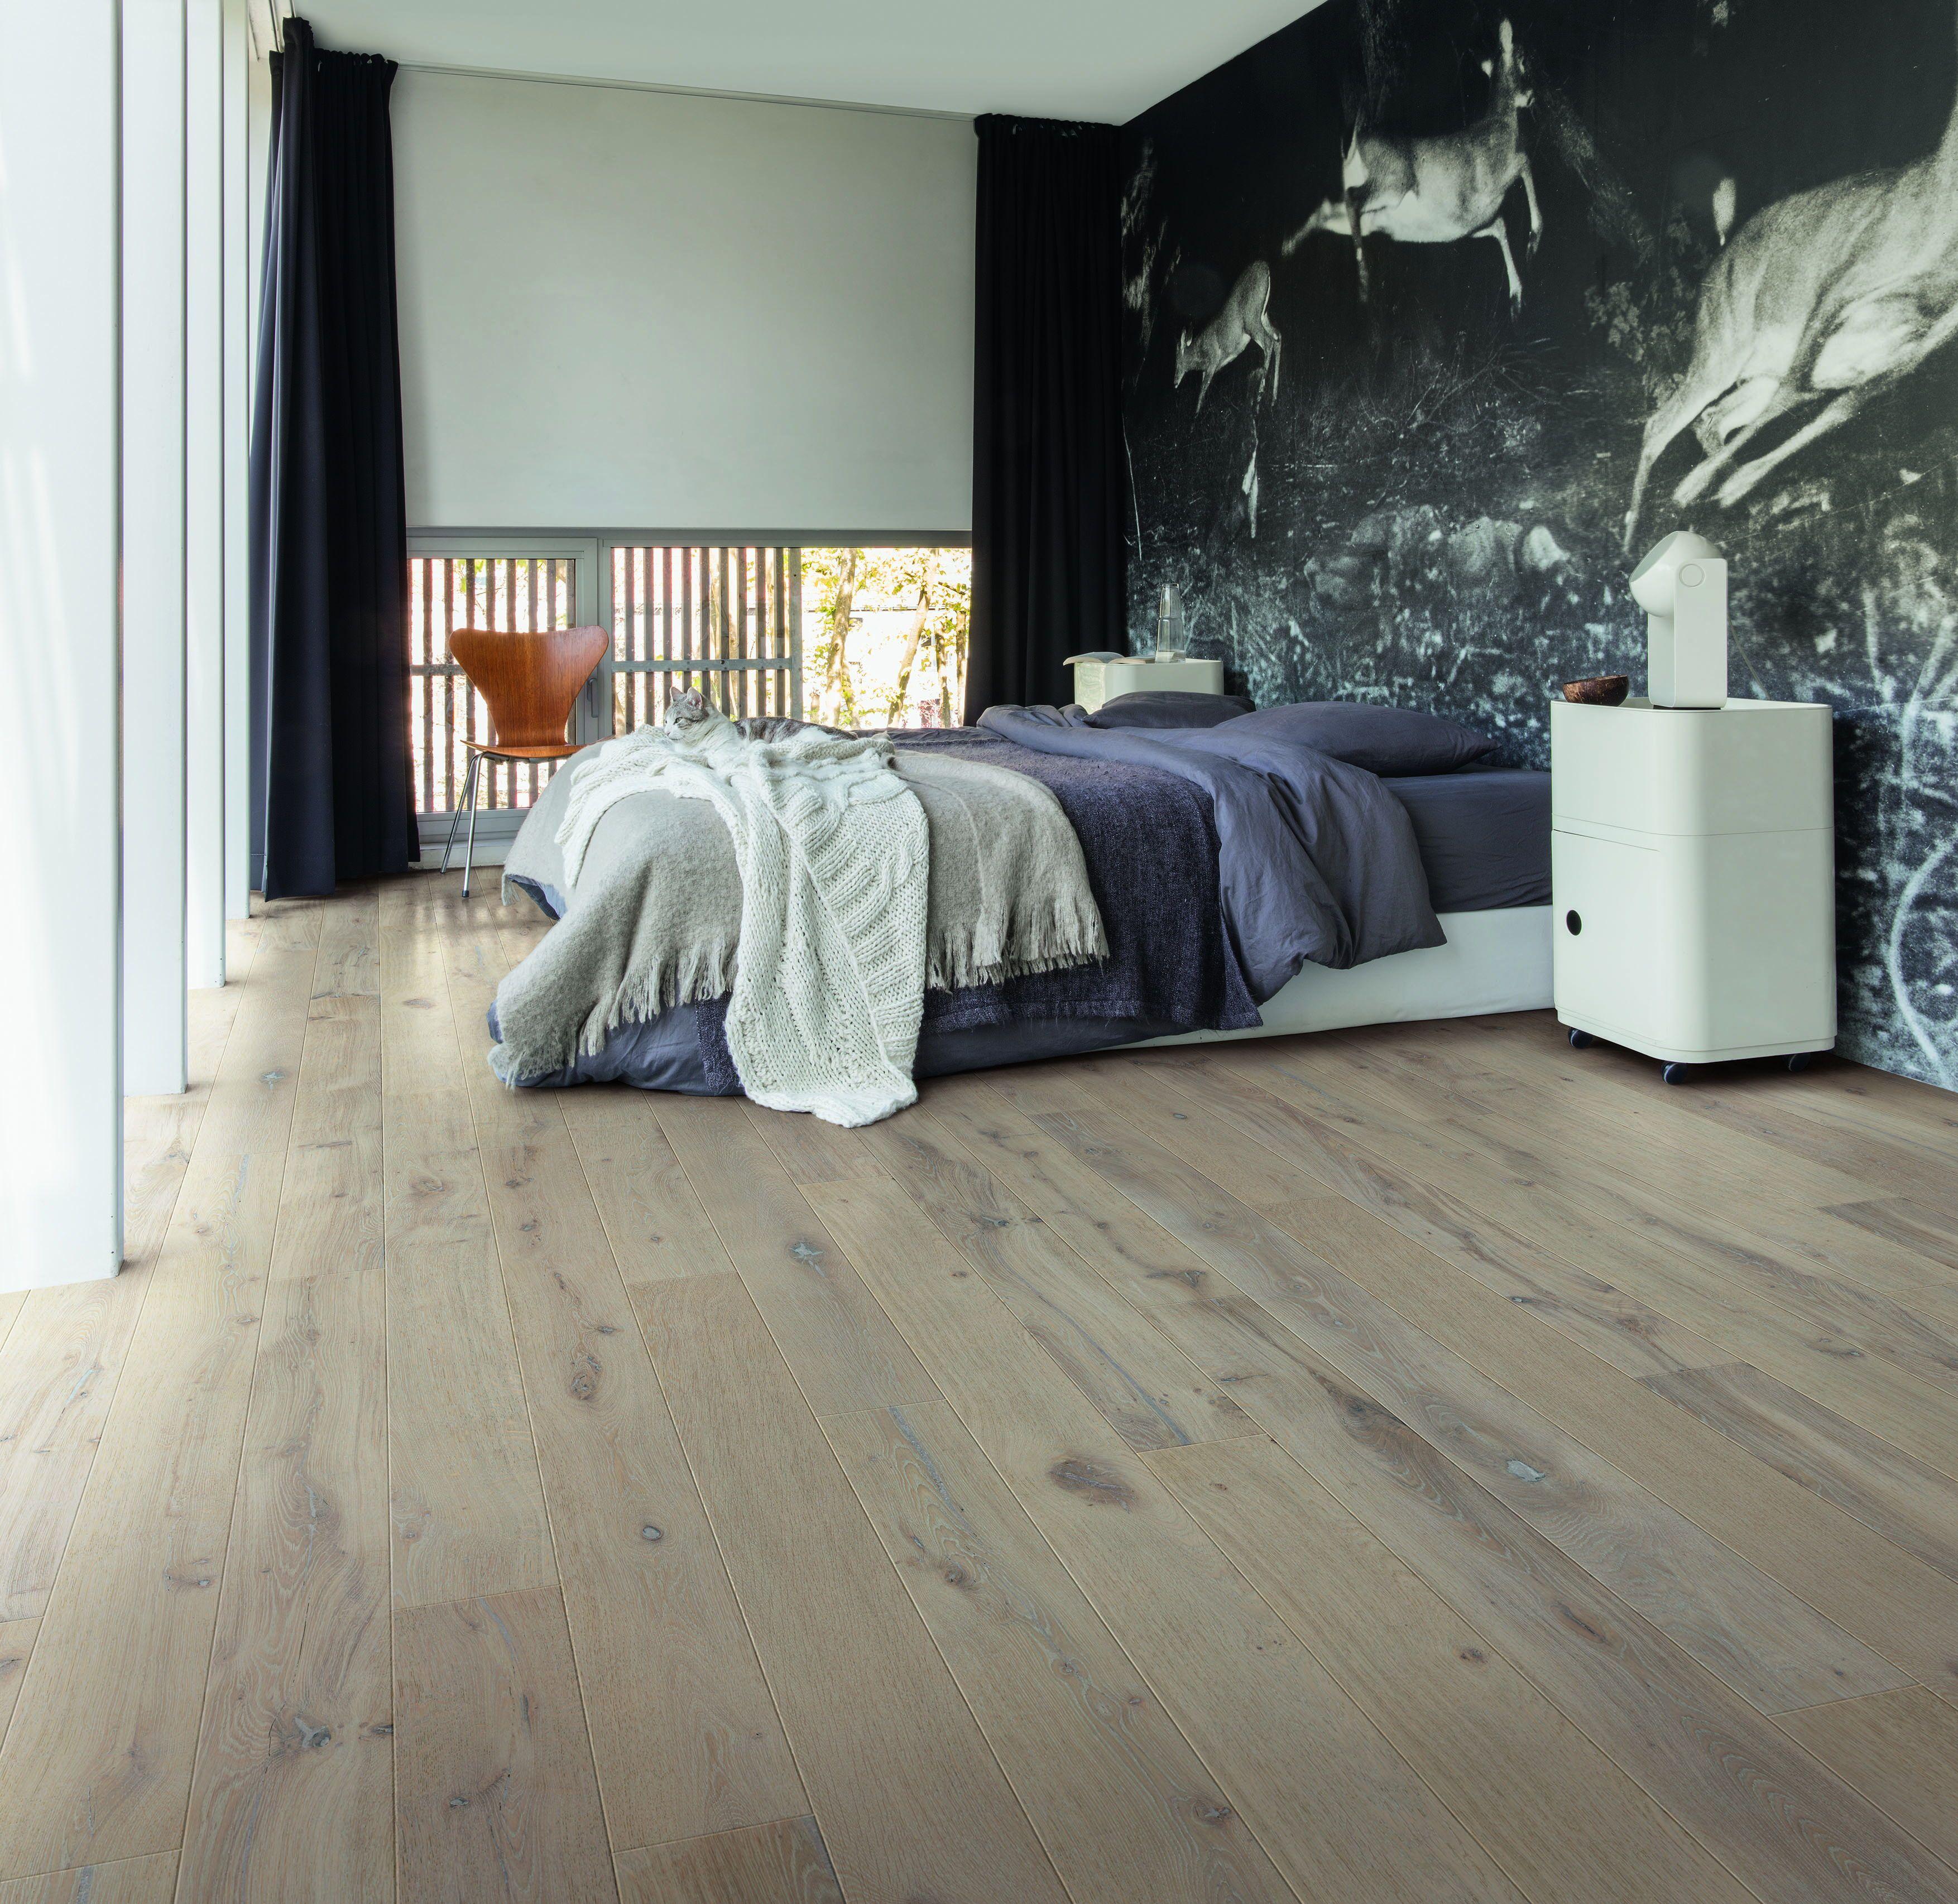 Comment Choisir Le Sol De Chambre Parfait Slaapkamer Vloer Slaapkamer Vloerbedekking Interieur Slaapkamer